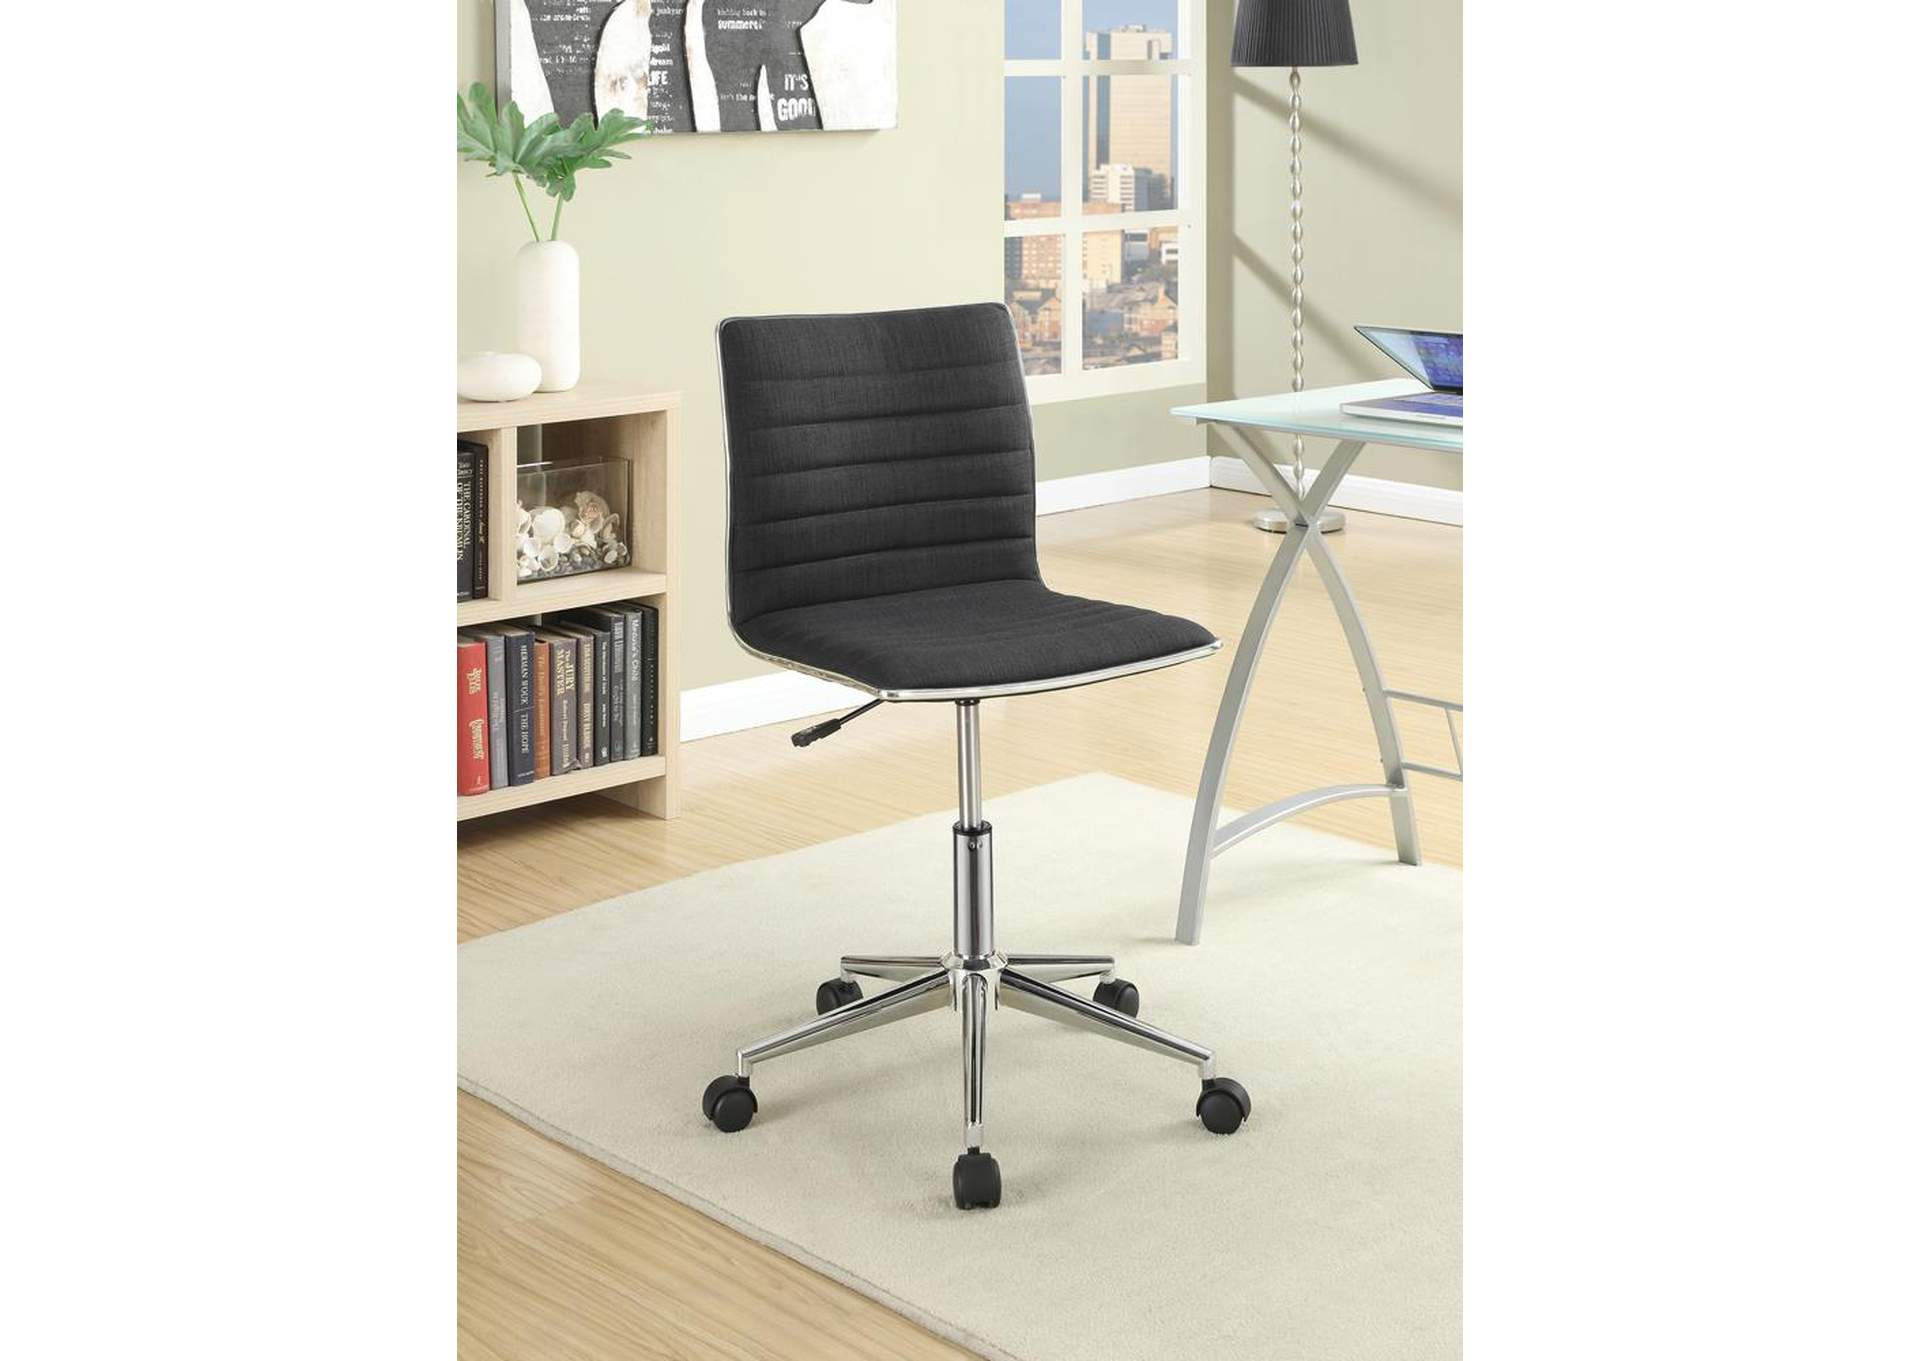 Gardner Discount Furniture Gardner Ma Furniture Outlets Black Office Chair